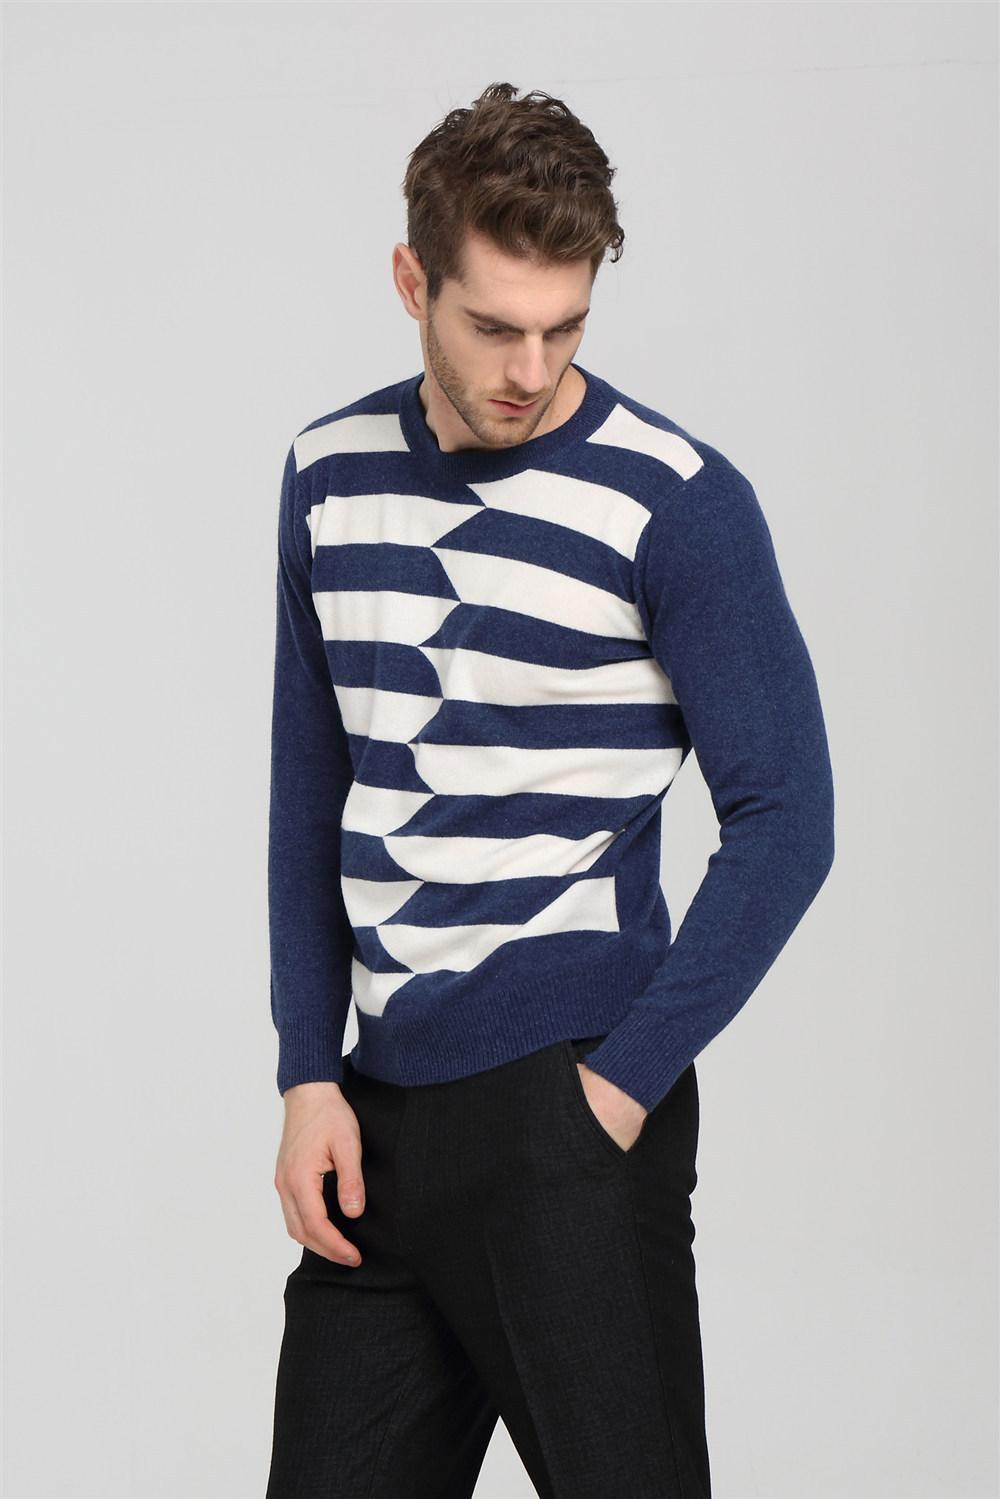 suéter de cachemir para hombre con rayas